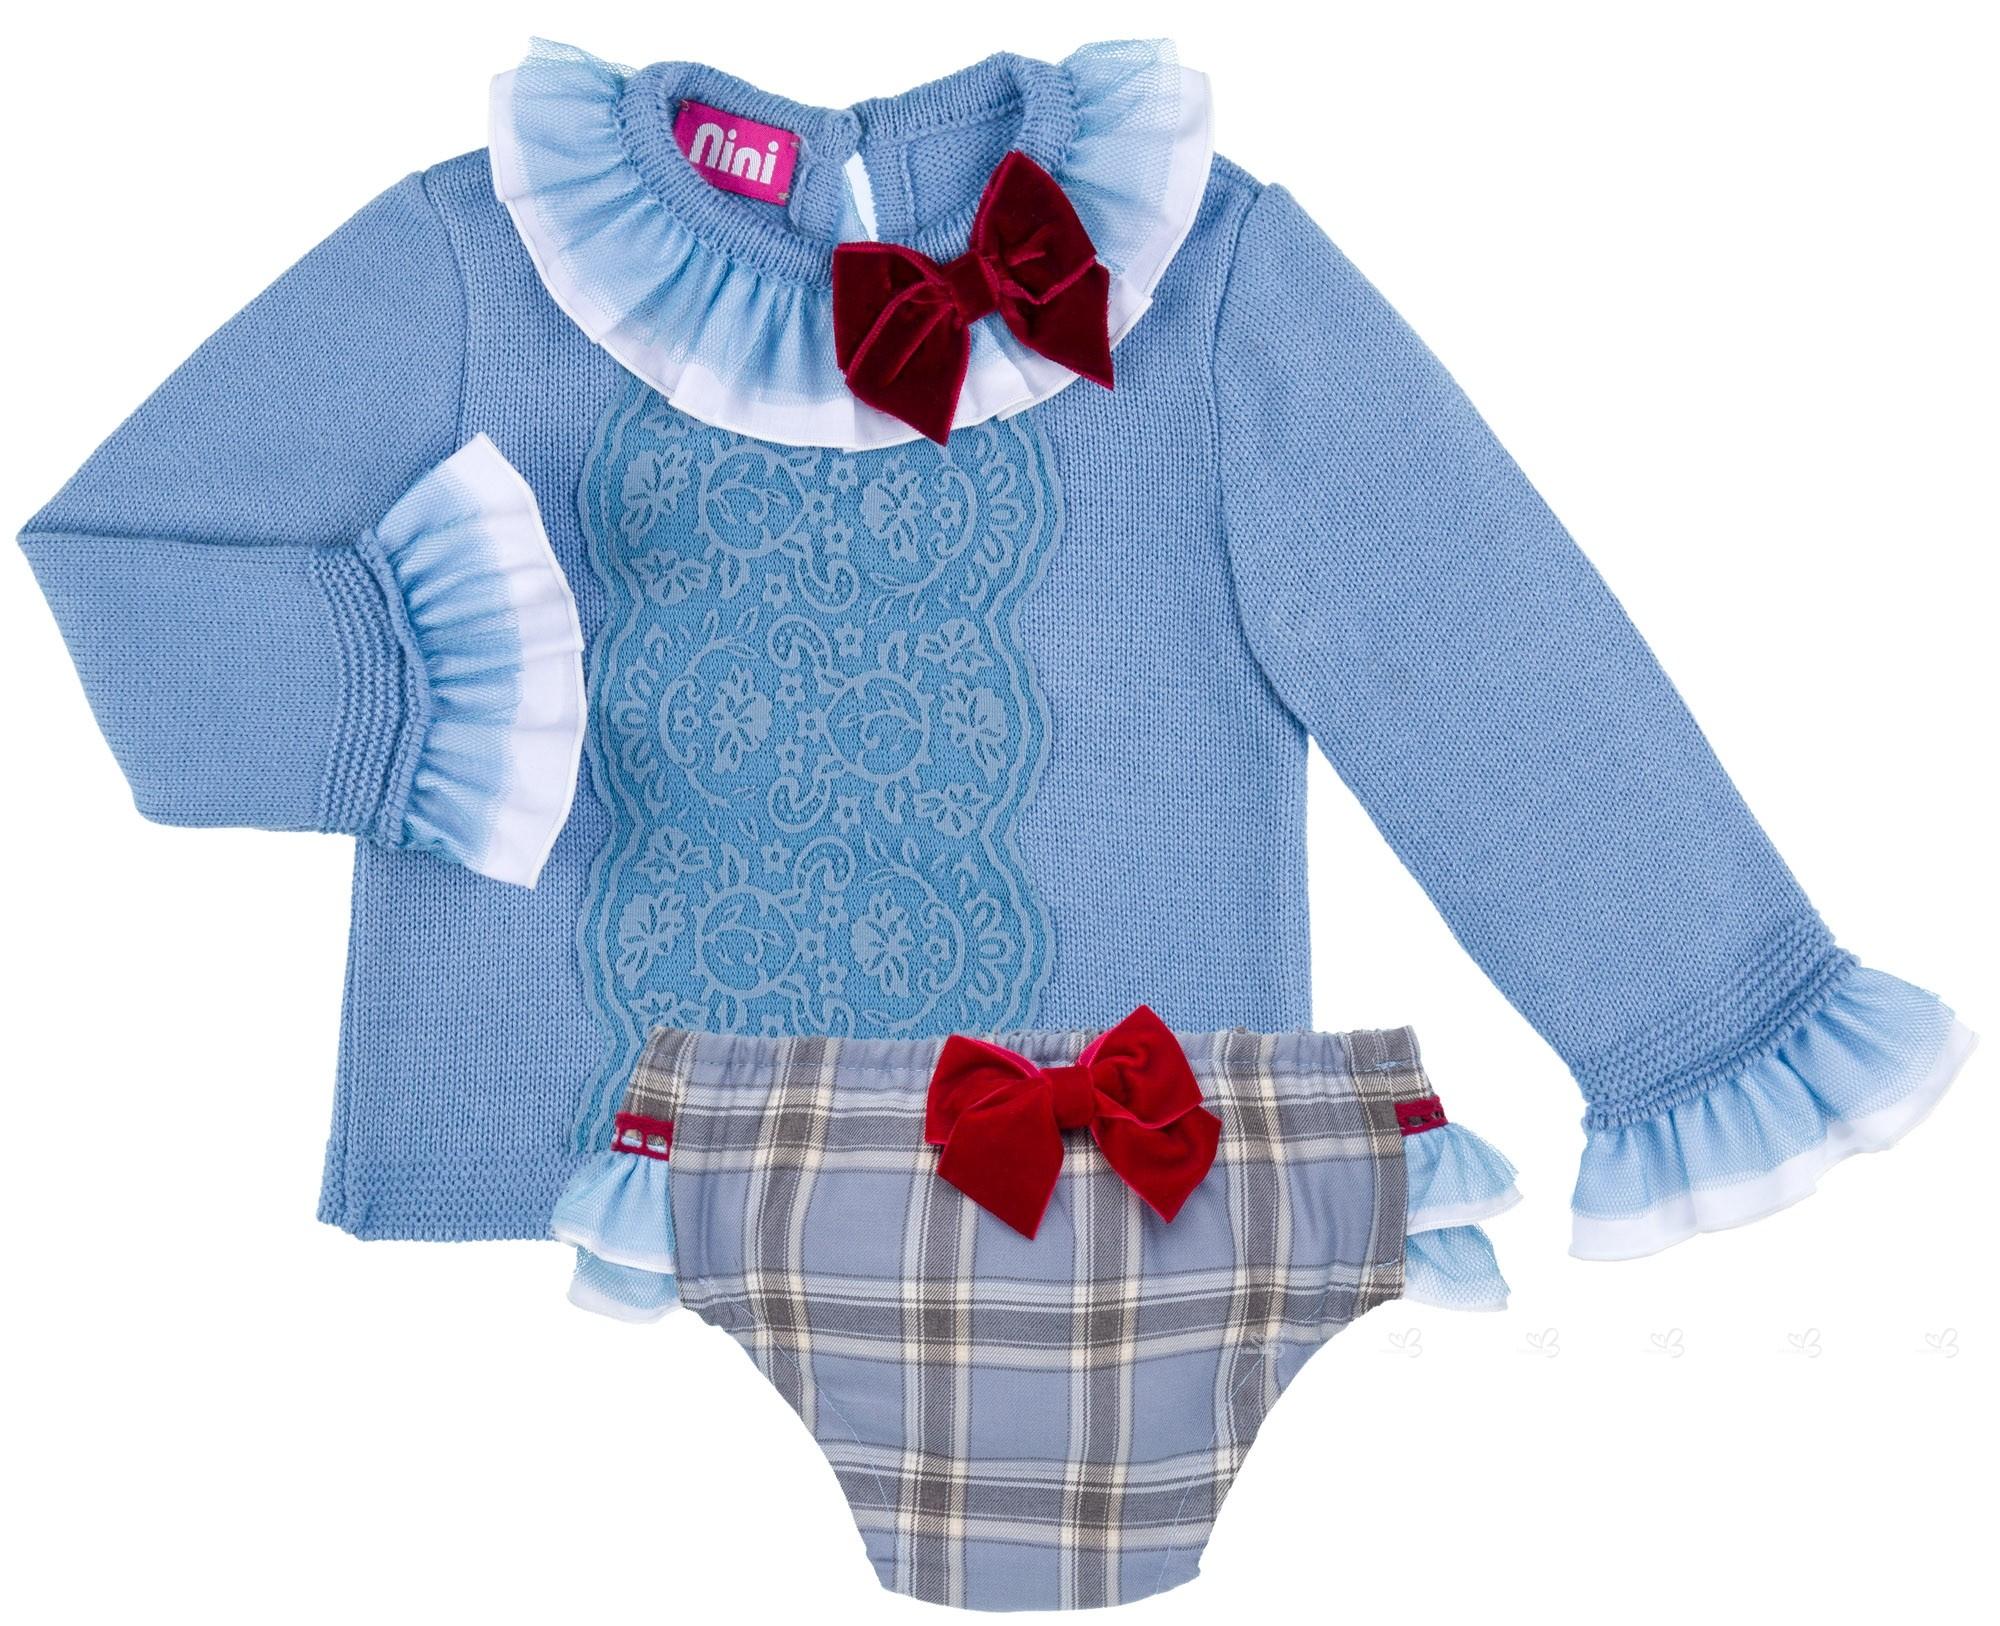 4fa3bf9651413 Nini Moda Infantil Conjunto Bebé Niña Jersey Punto   Braguita Cuadros  Celeste ...